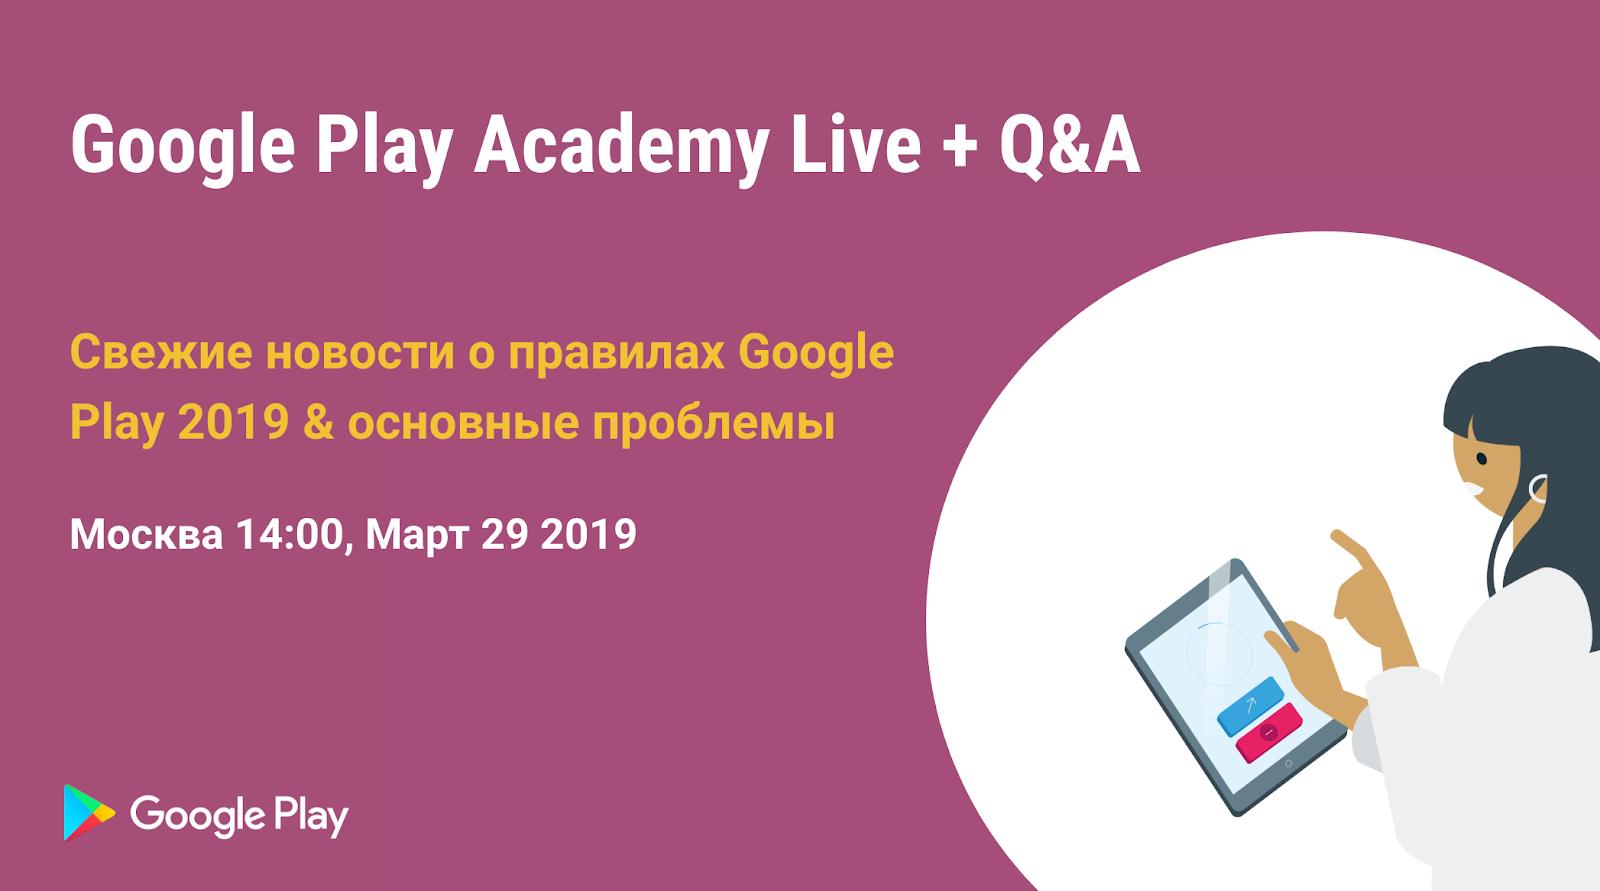 Присоединяйся Google Play Вебинар 29 Марта